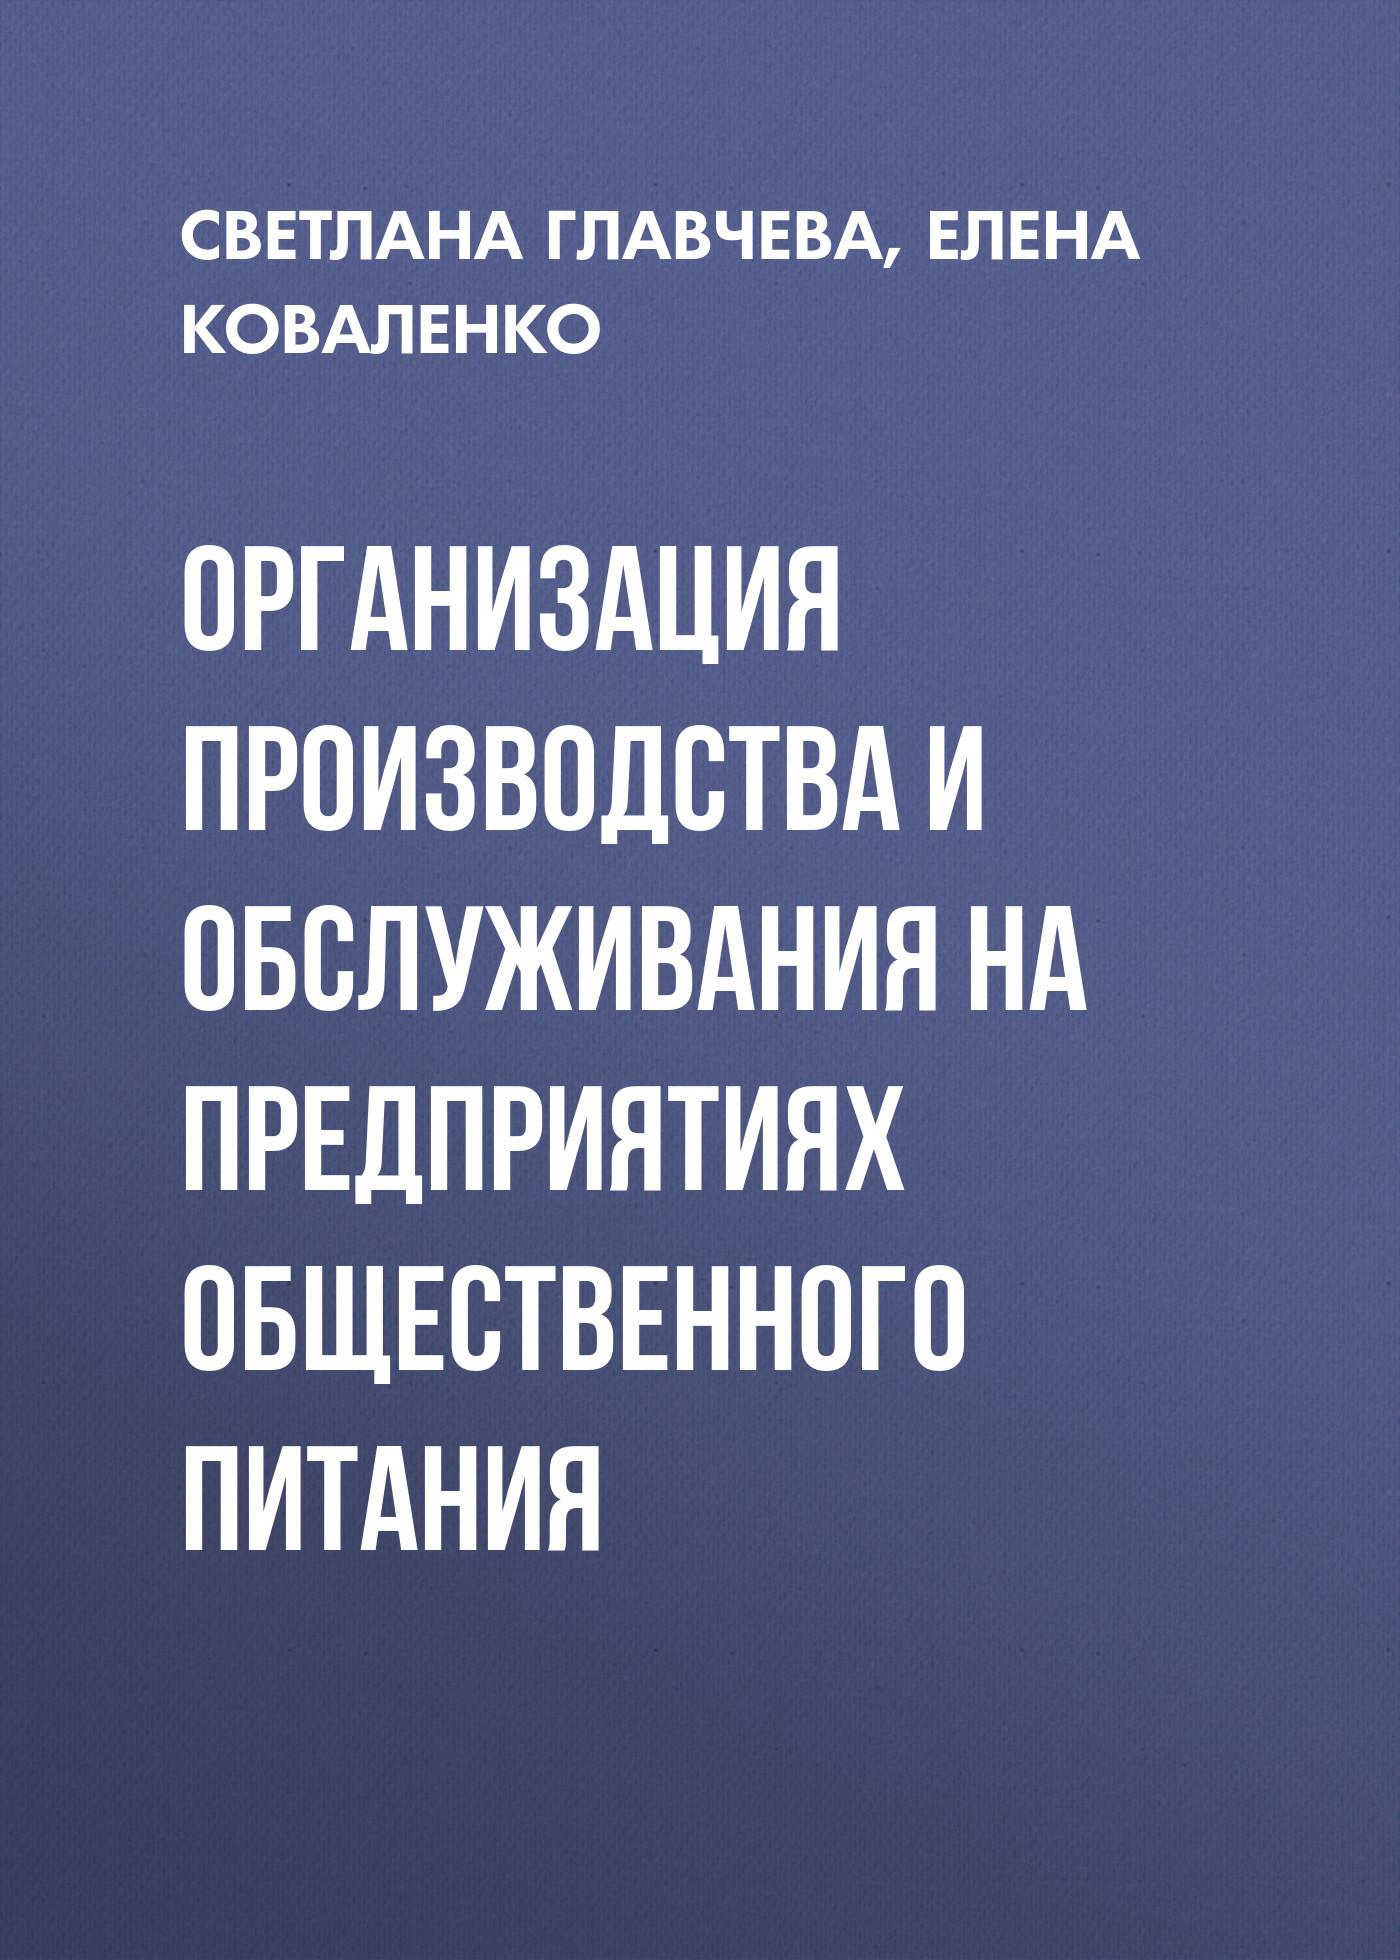 все цены на Елена Коваленко Организация производства и обслуживания на предприятиях общественного питания ISBN: 978-5-7782-1766-9 онлайн